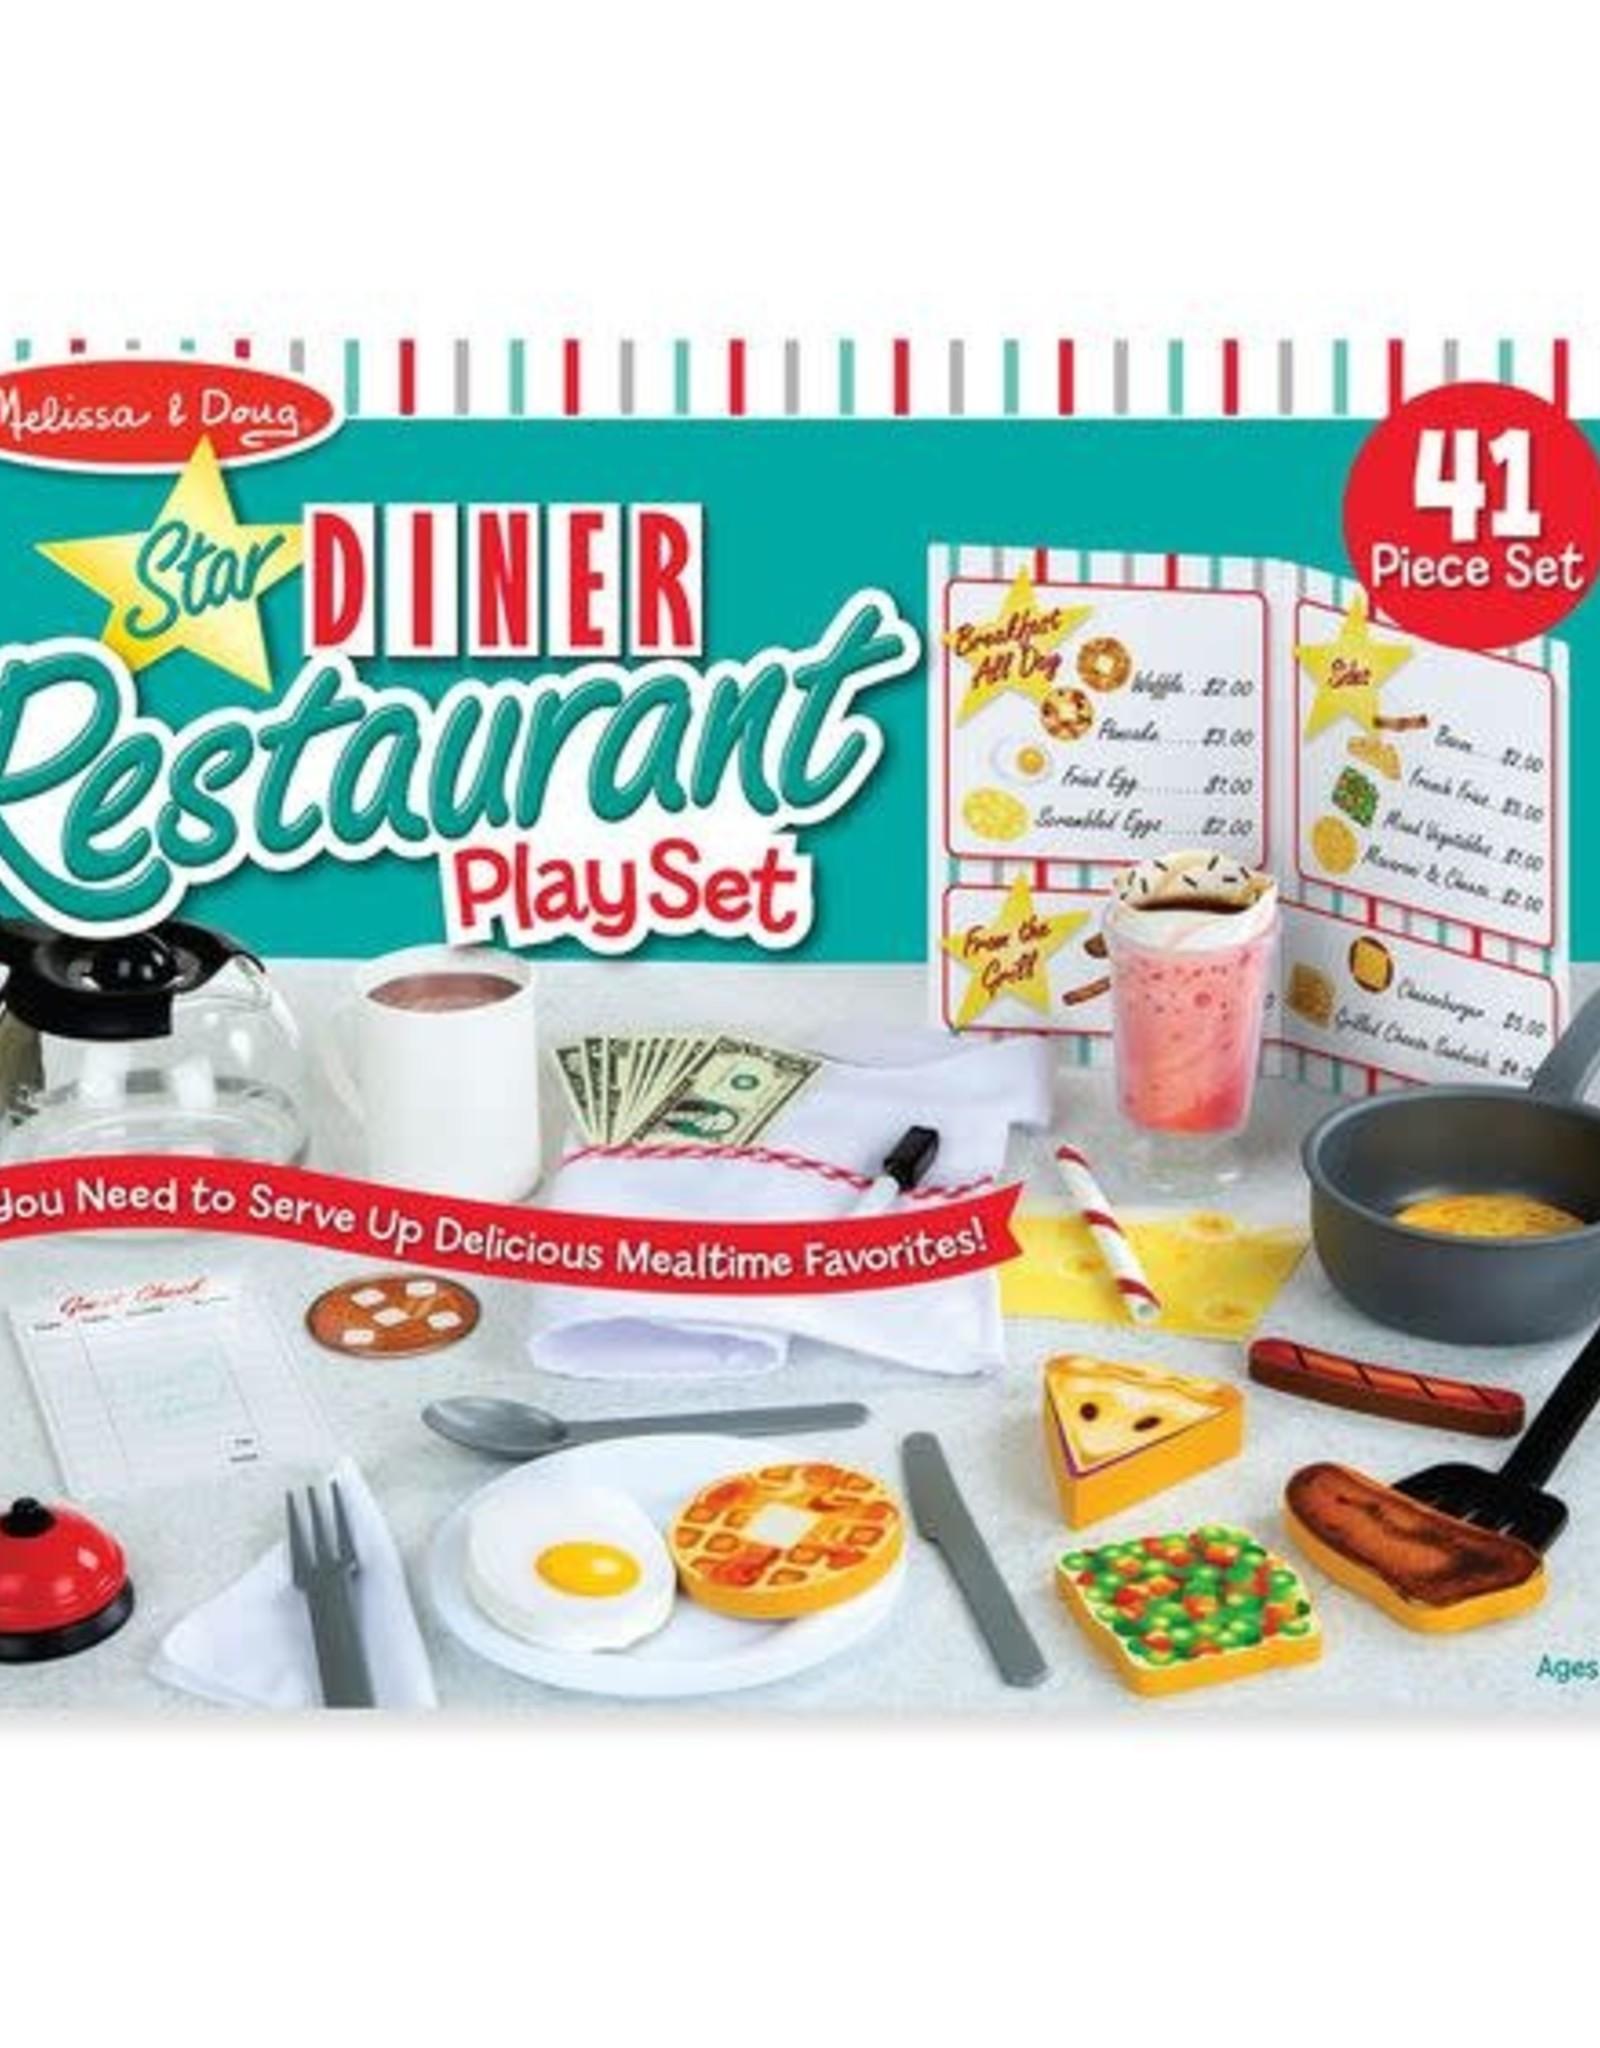 Melissa & Doug Melissa & Doug Star Diner Restaurant Play Set